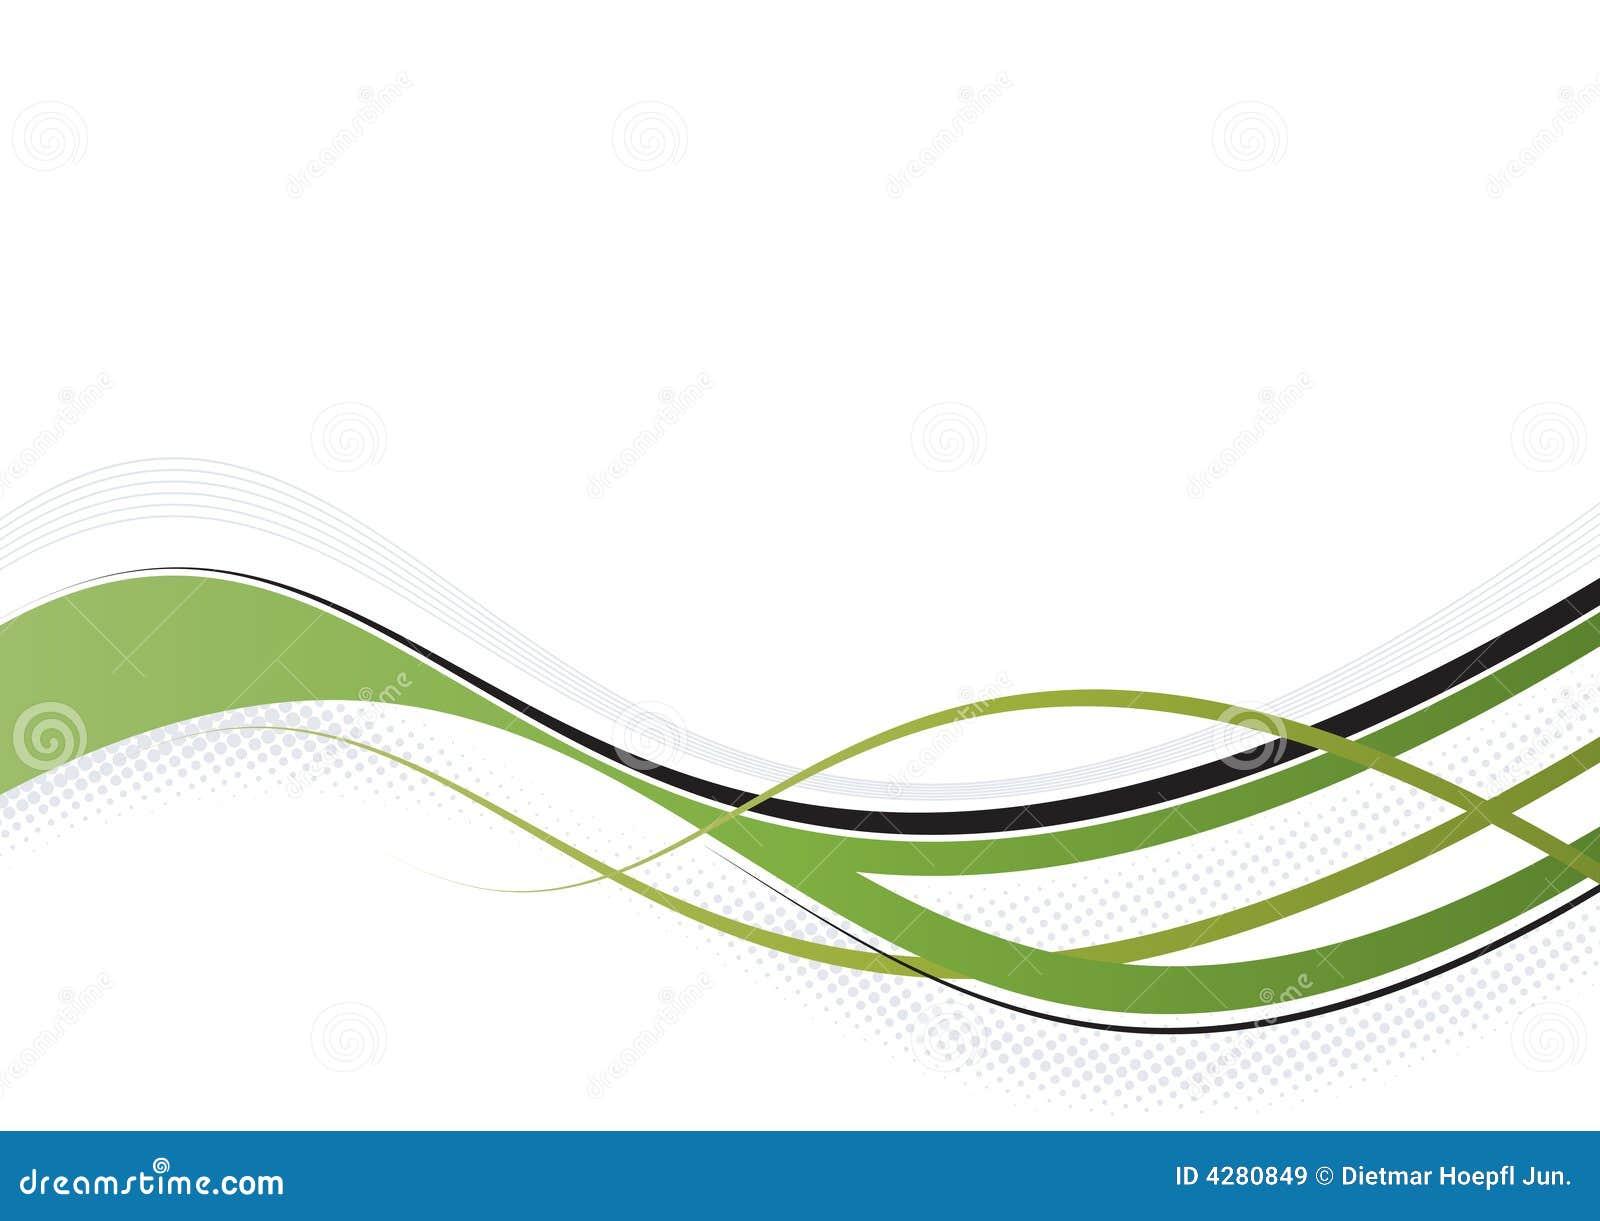 green wisp royalty free stock images image 4280849. Black Bedroom Furniture Sets. Home Design Ideas